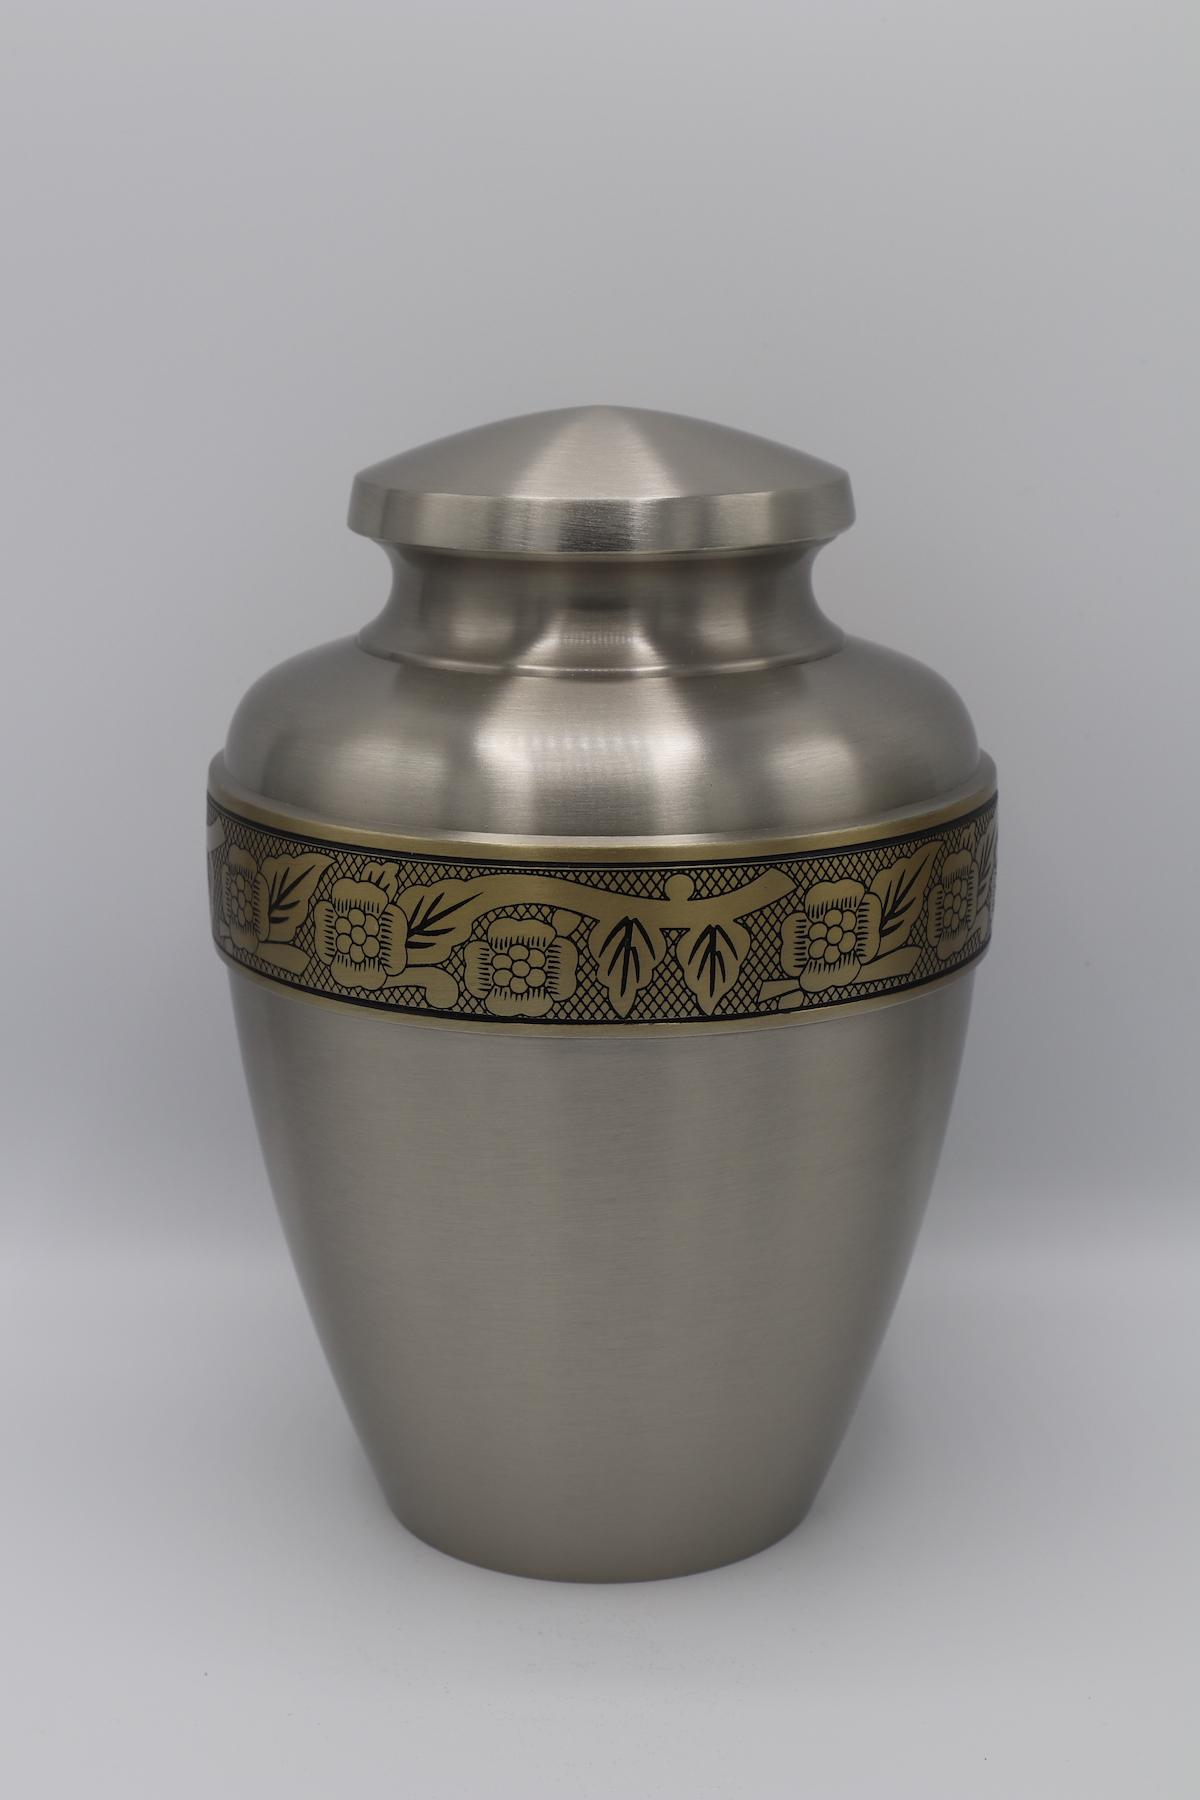 Avalon Pewter Cremation Urn